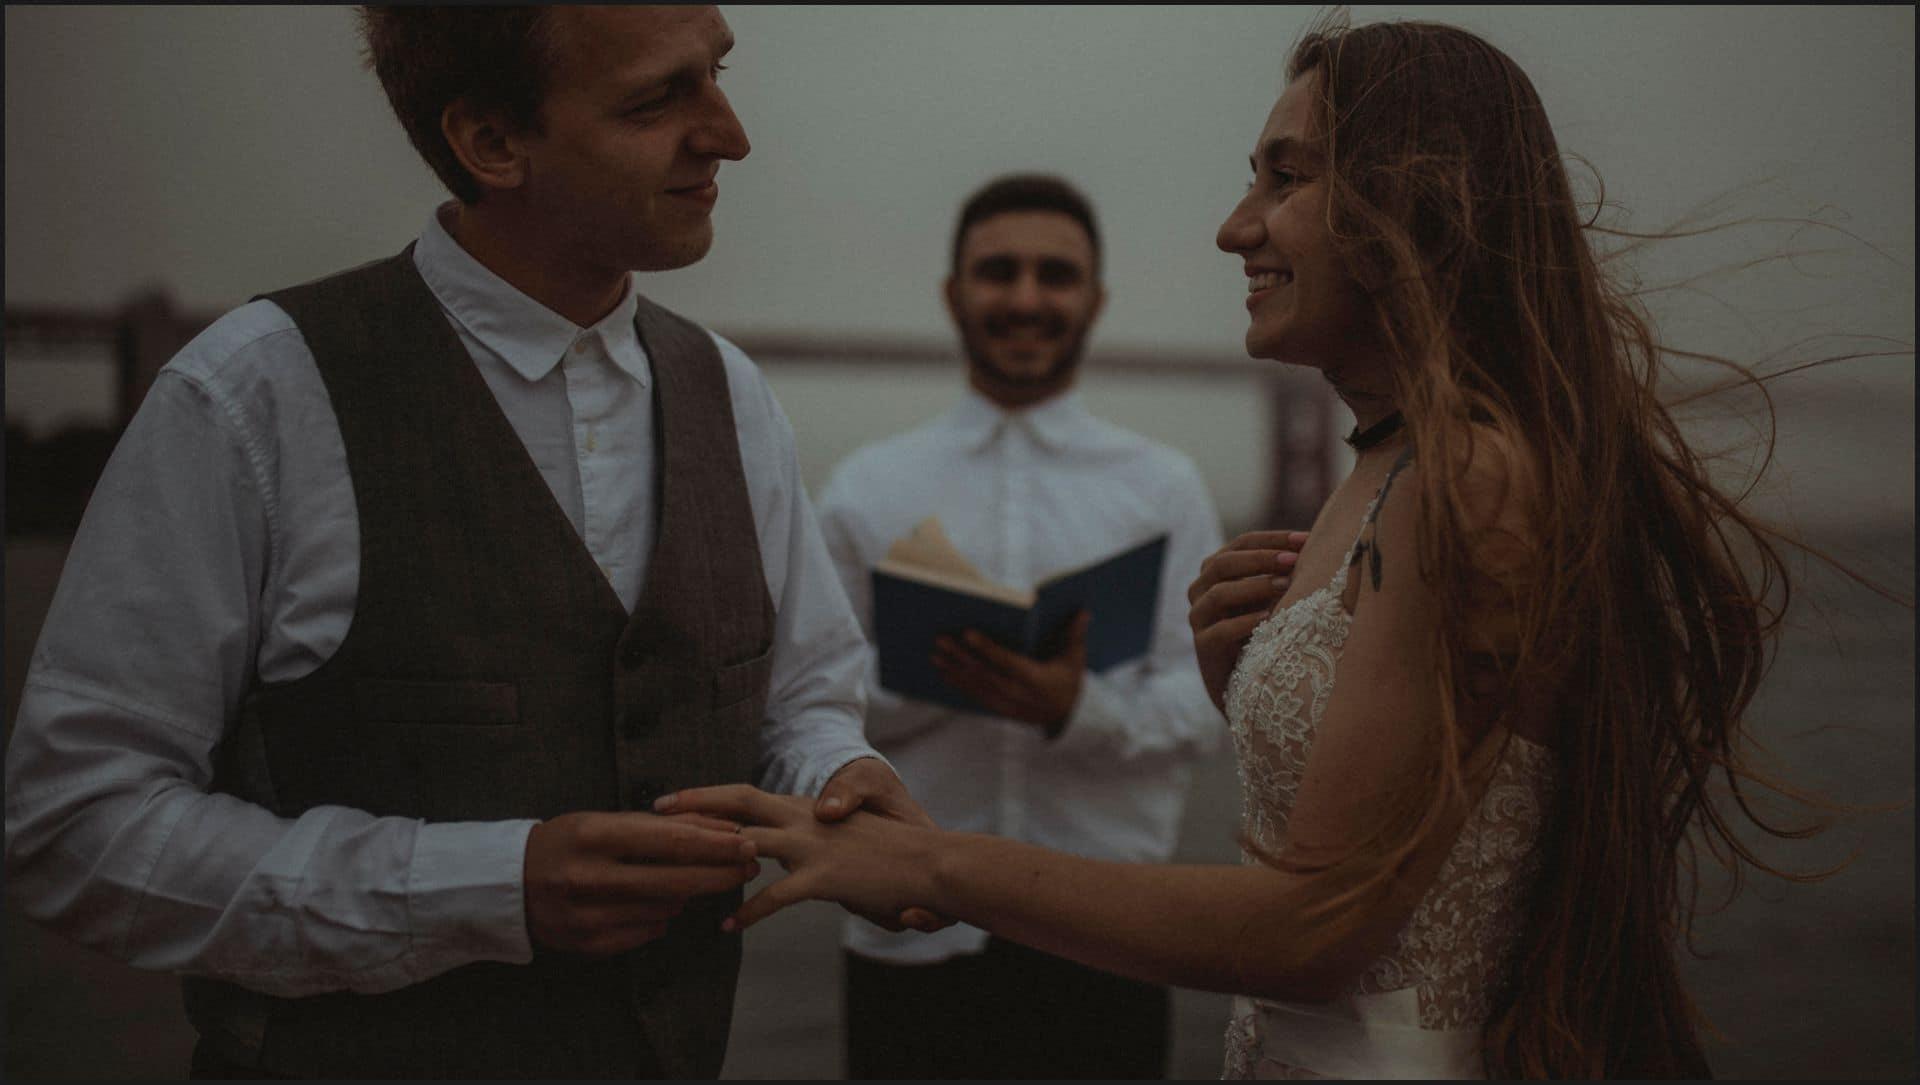 san francisco, california, elopement wedding, wedding ring, symbolic ceremony